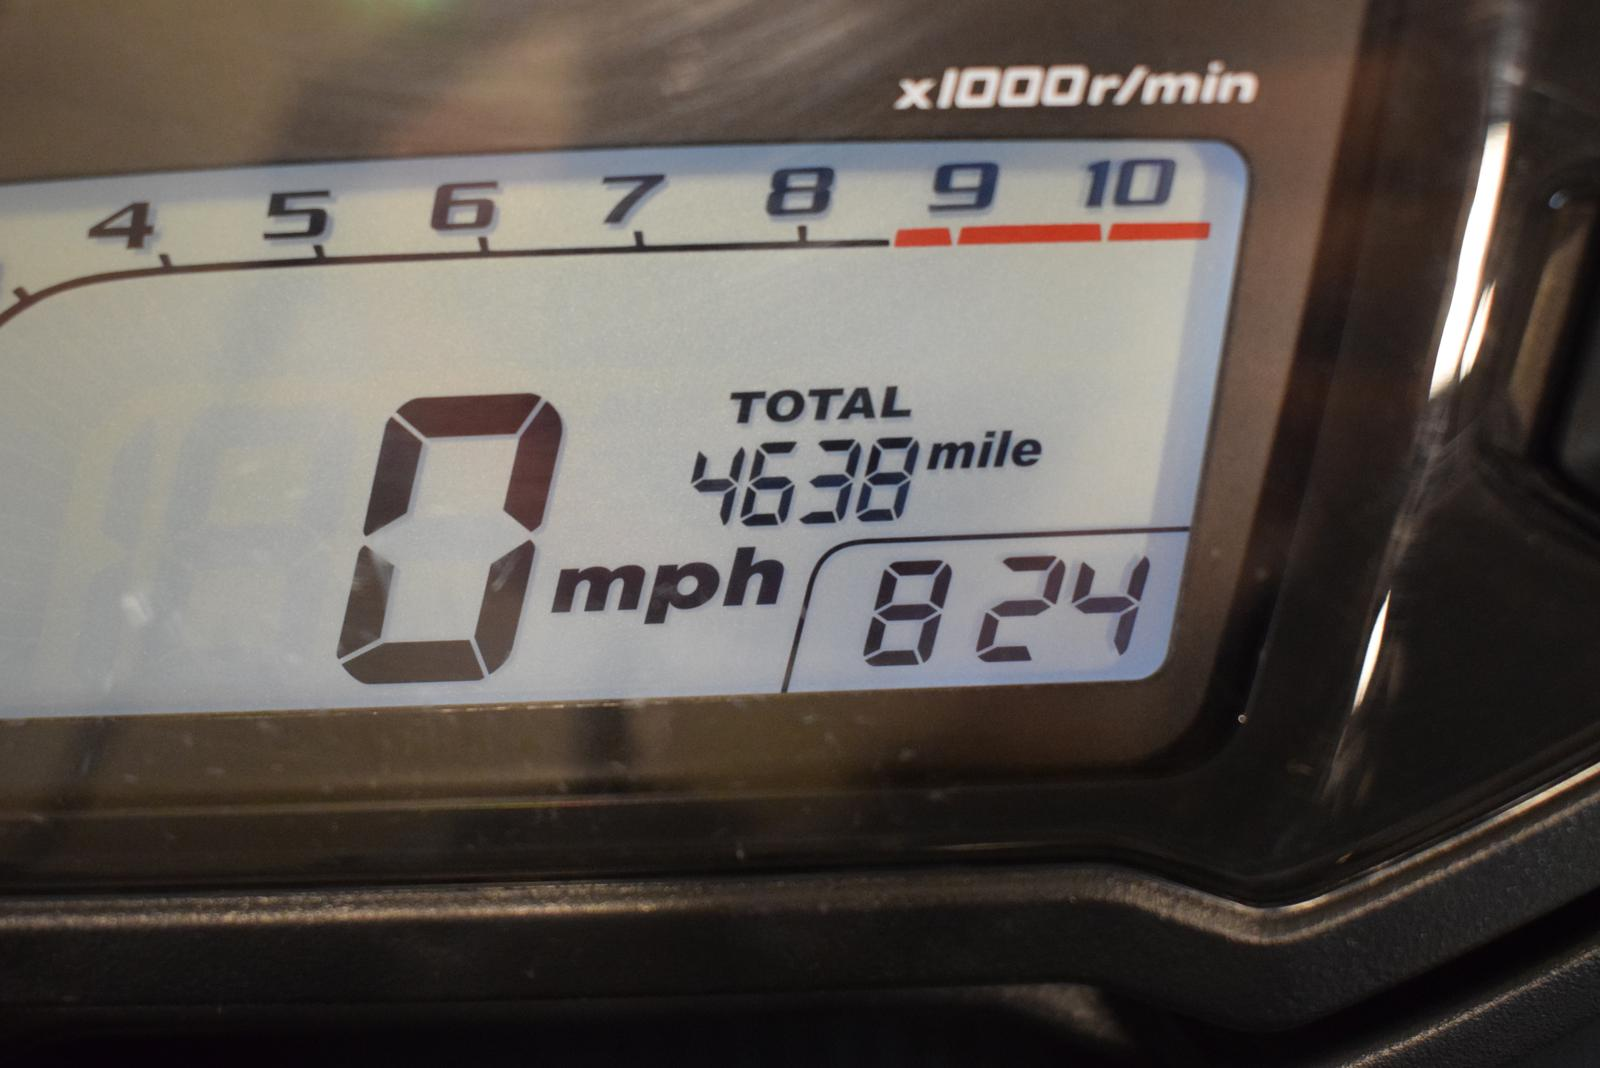 2016 Honda Cbr 500r Cbr500r For Sale In Peninsula Oh State 8